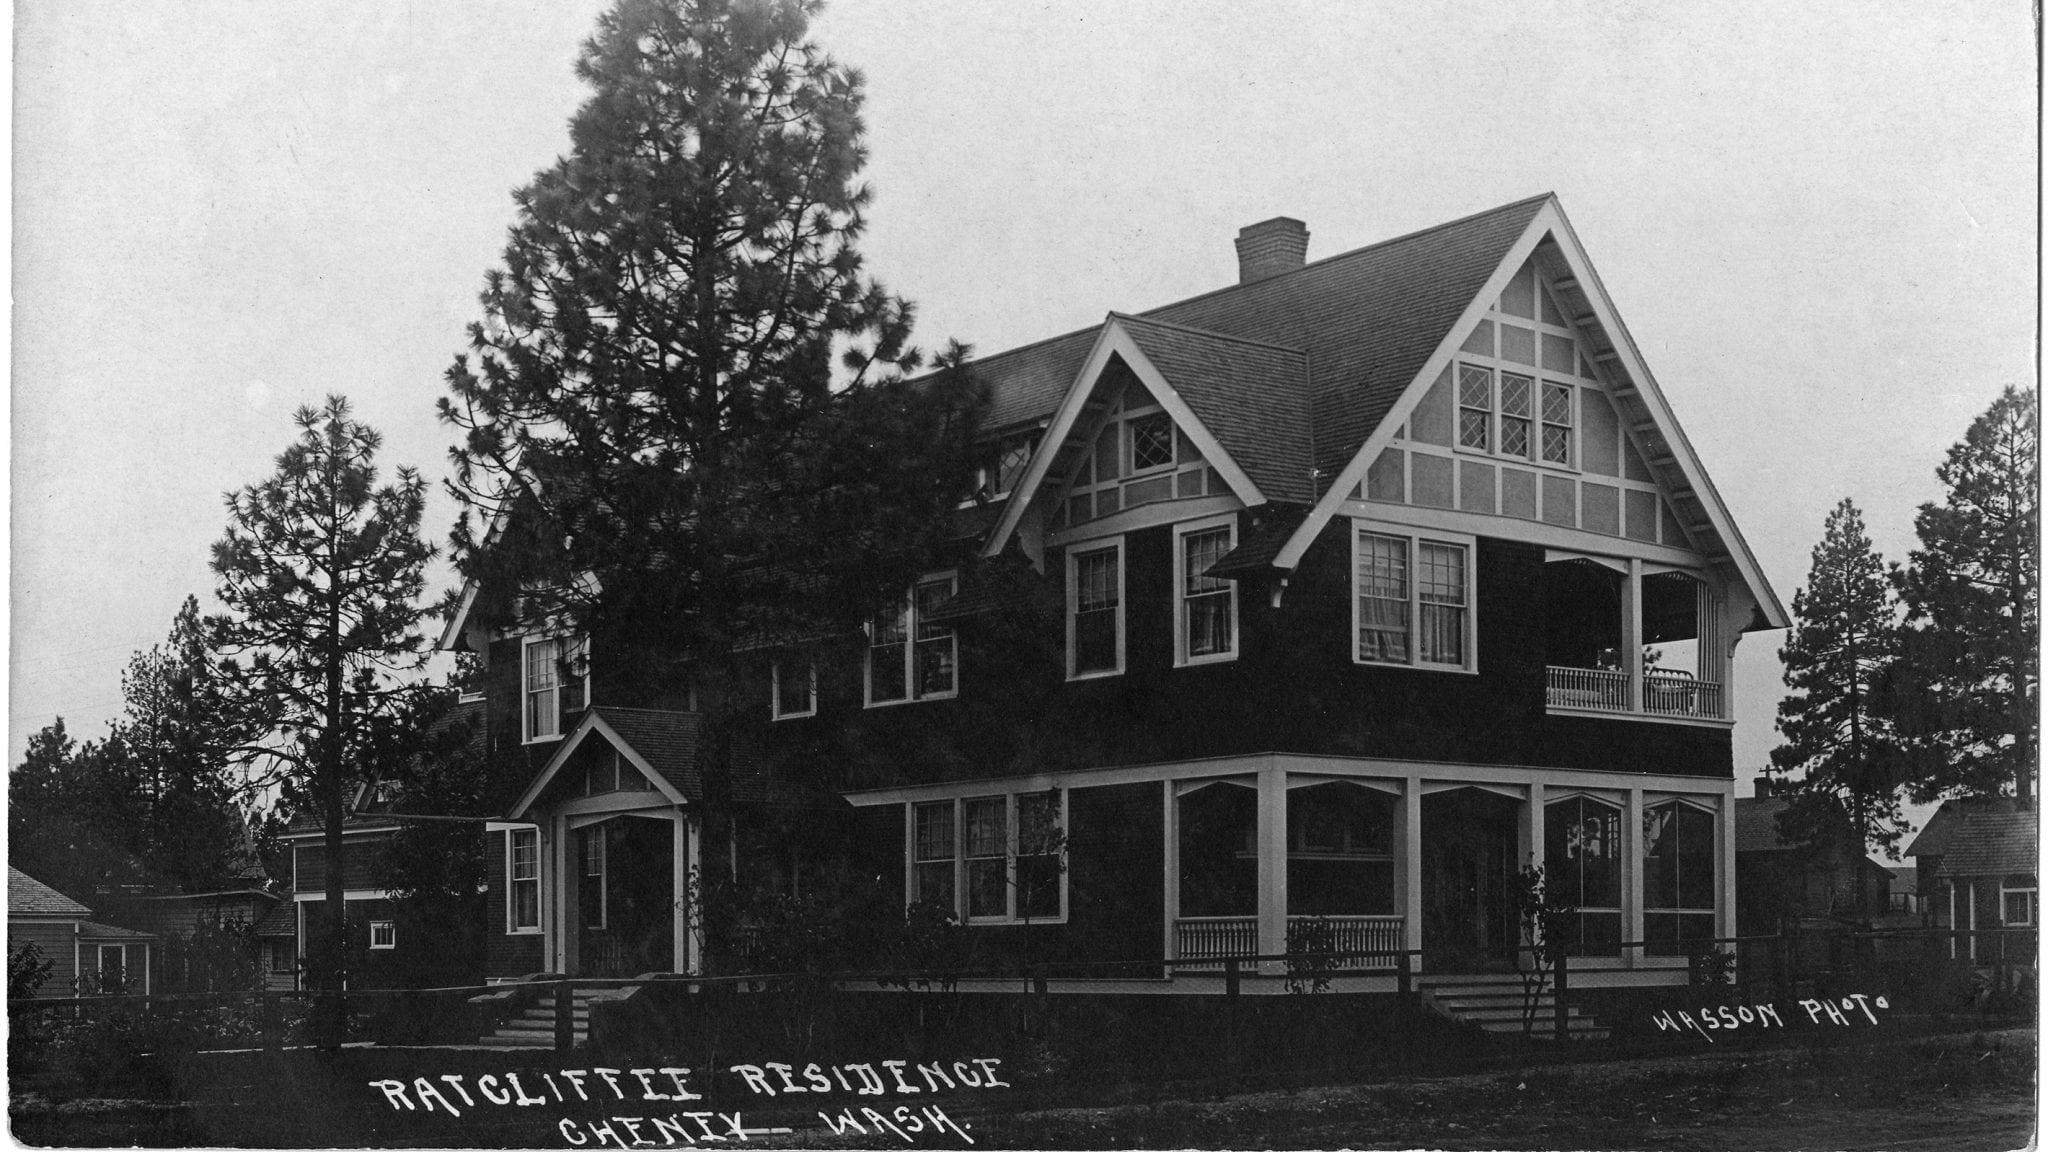 Ratcliffe House